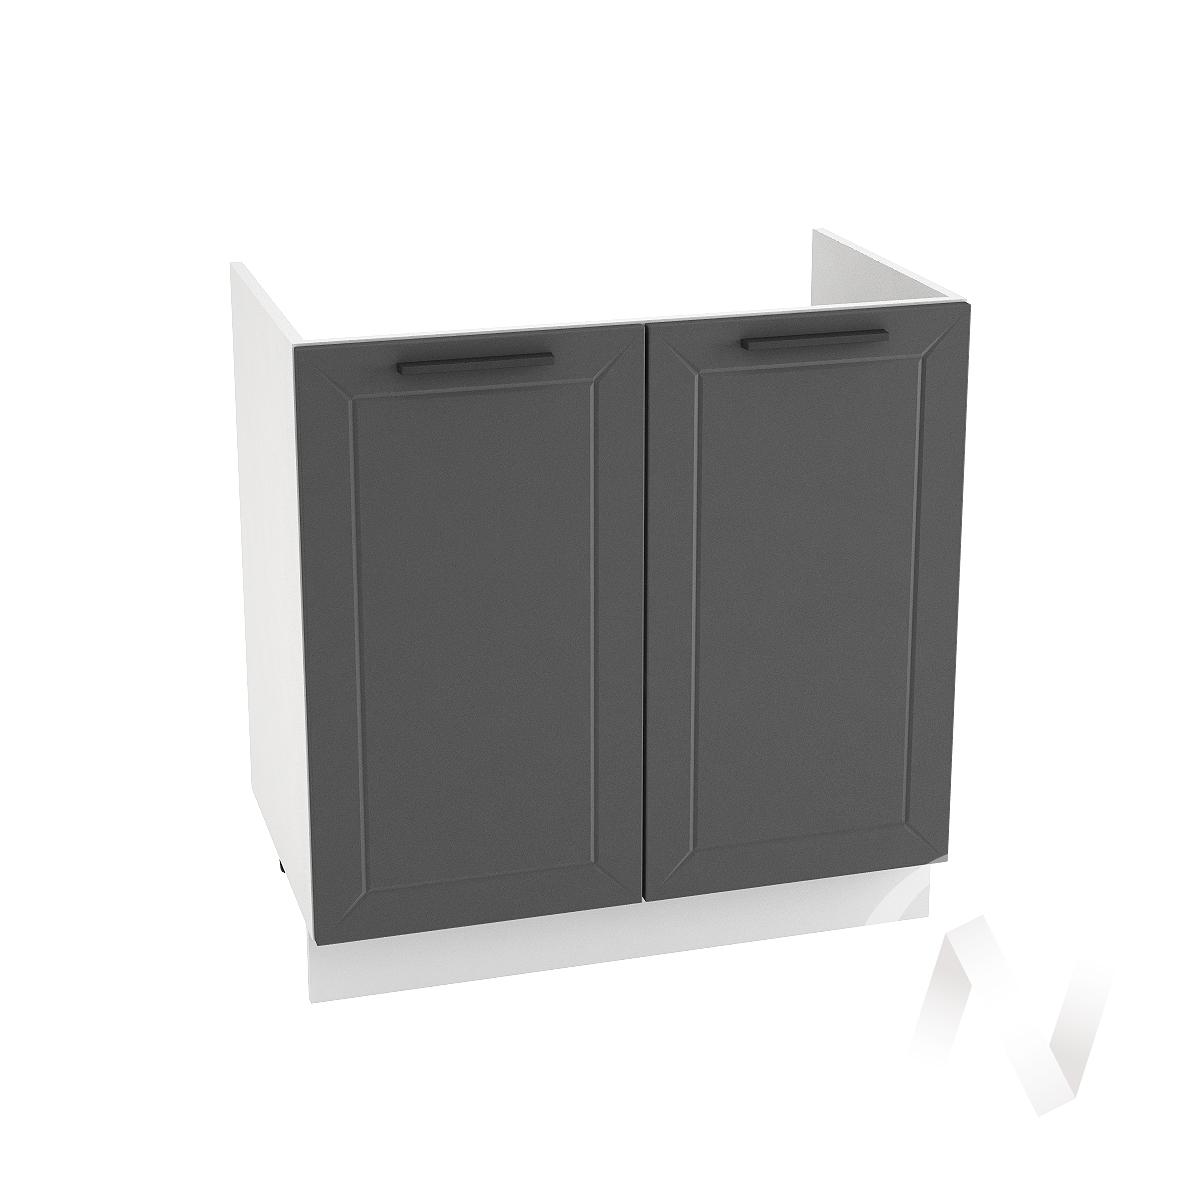 "Кухня ""Глетчер"": Шкаф нижний под мойку 800, ШНМ 800 новый (Маренго силк/корпус белый)"